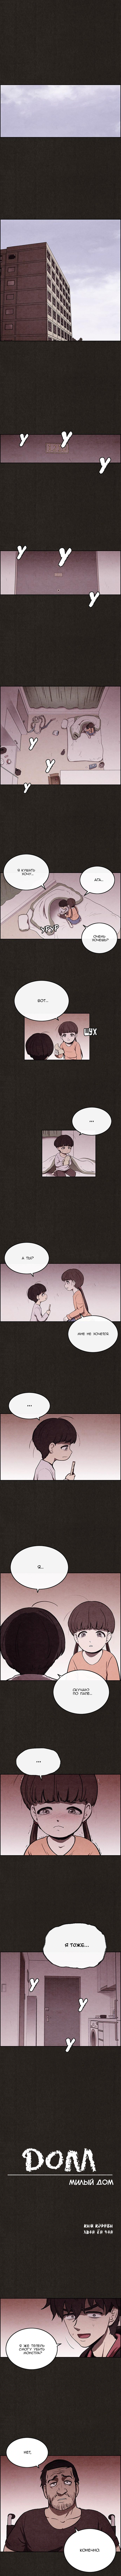 https://r1.ninemanga.com/comics/pic2/26/33050/415979/1532297884904.jpg Page 1